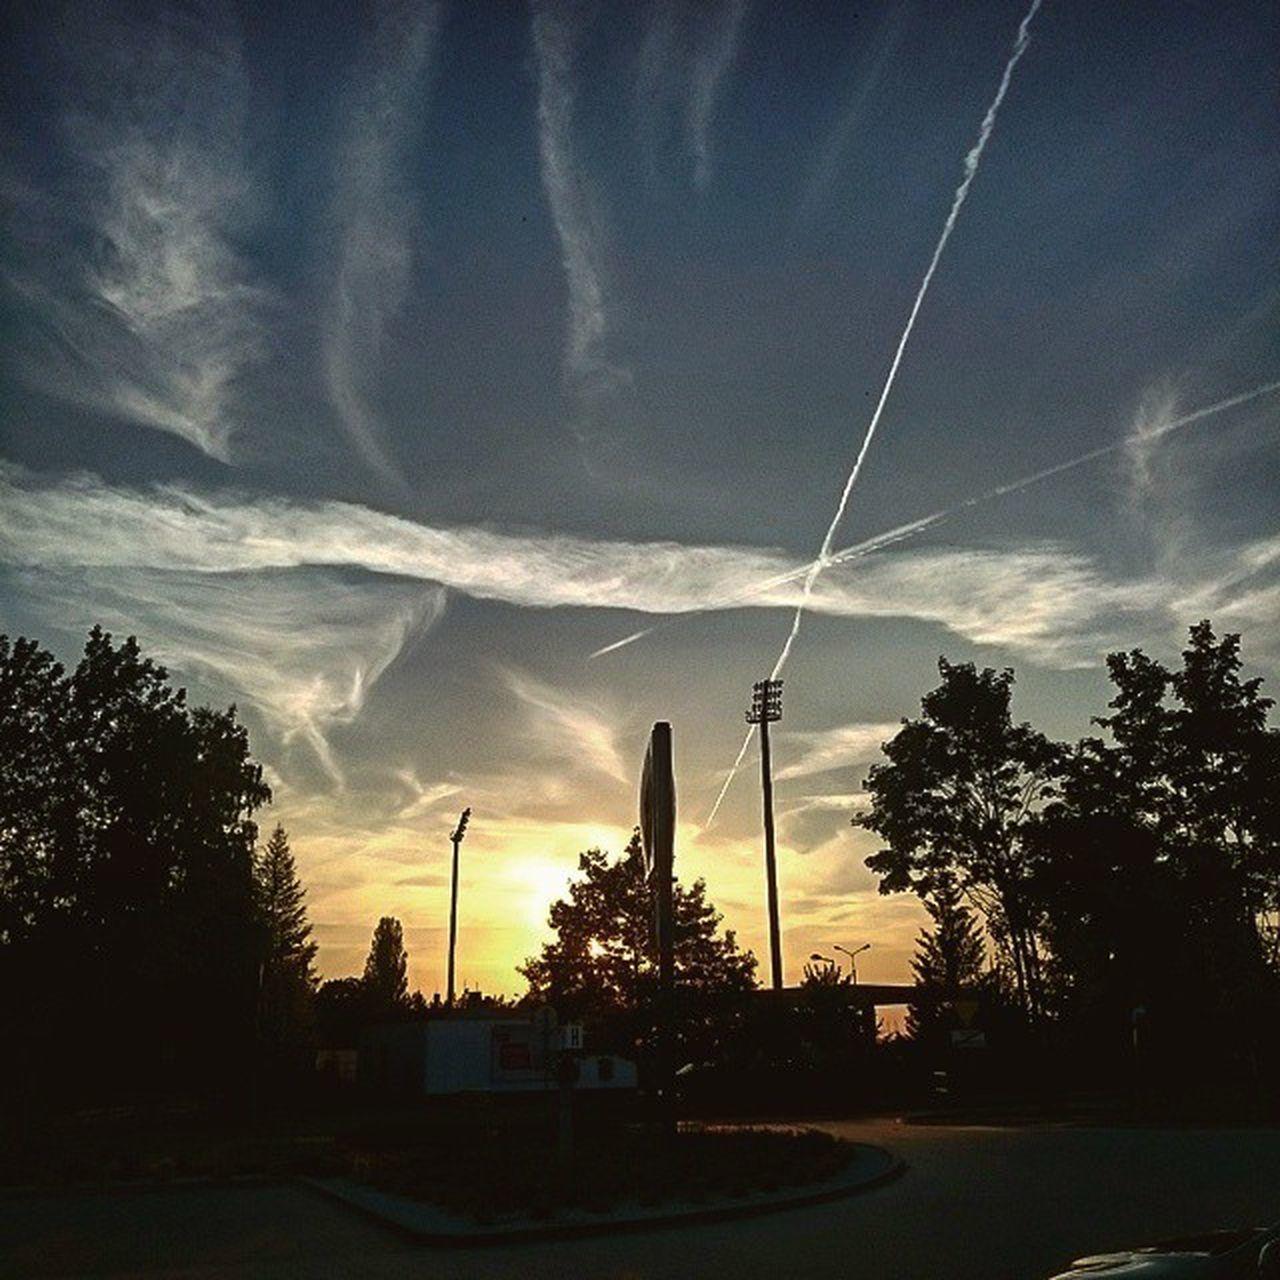 Sky Clouds Sun Sunset Air Streak Niebo Słońce Chmury Zachod Smugi Polkowice